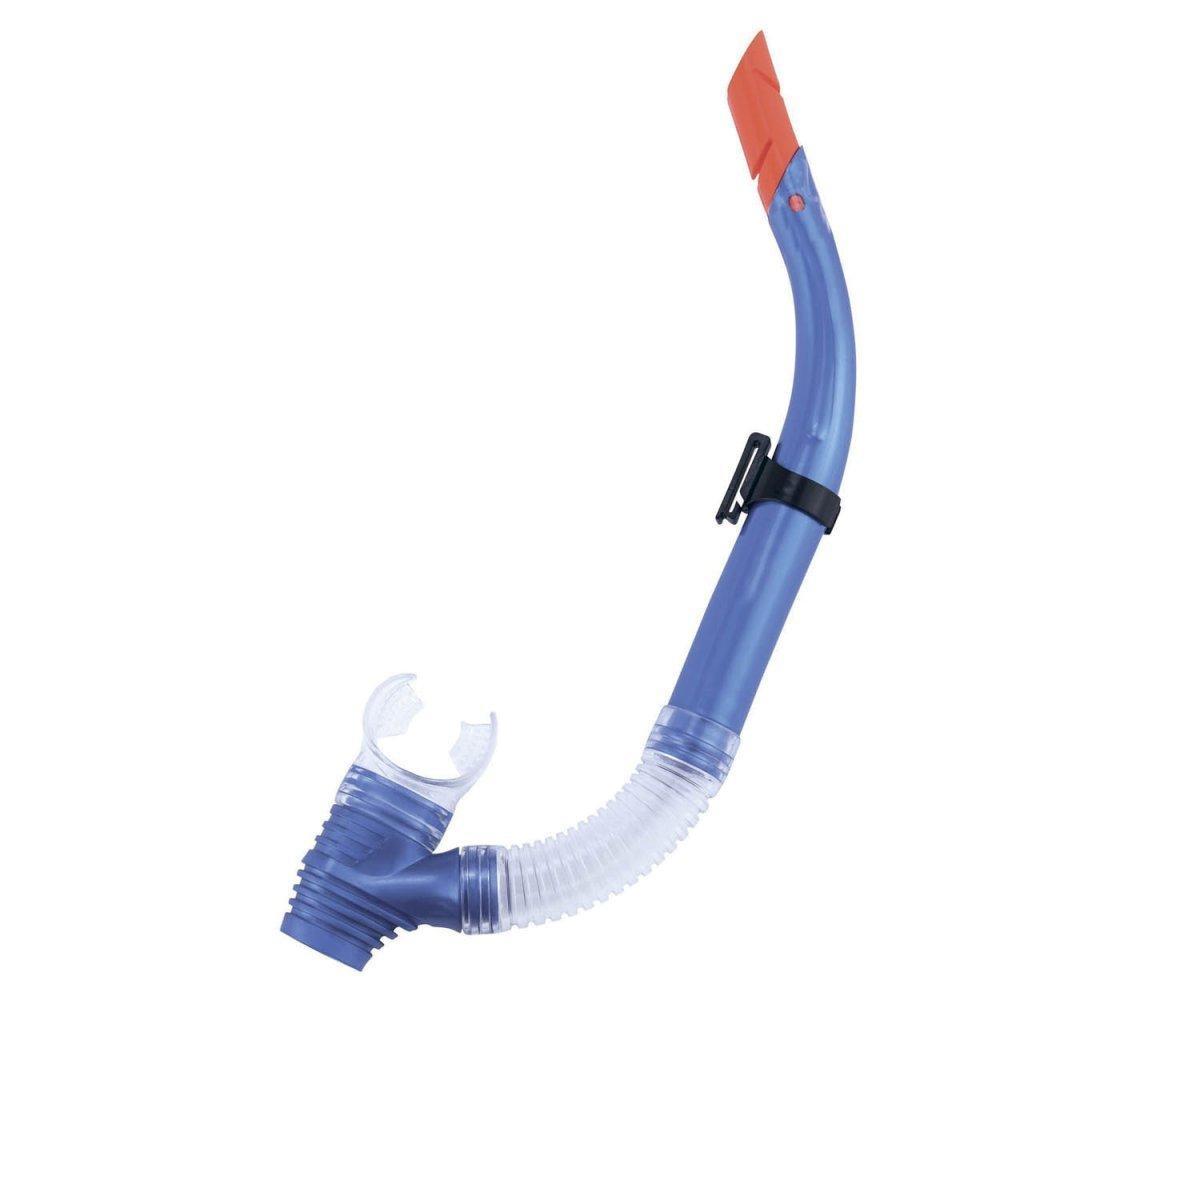 Трубка для плавания Bestway 23012, синяя